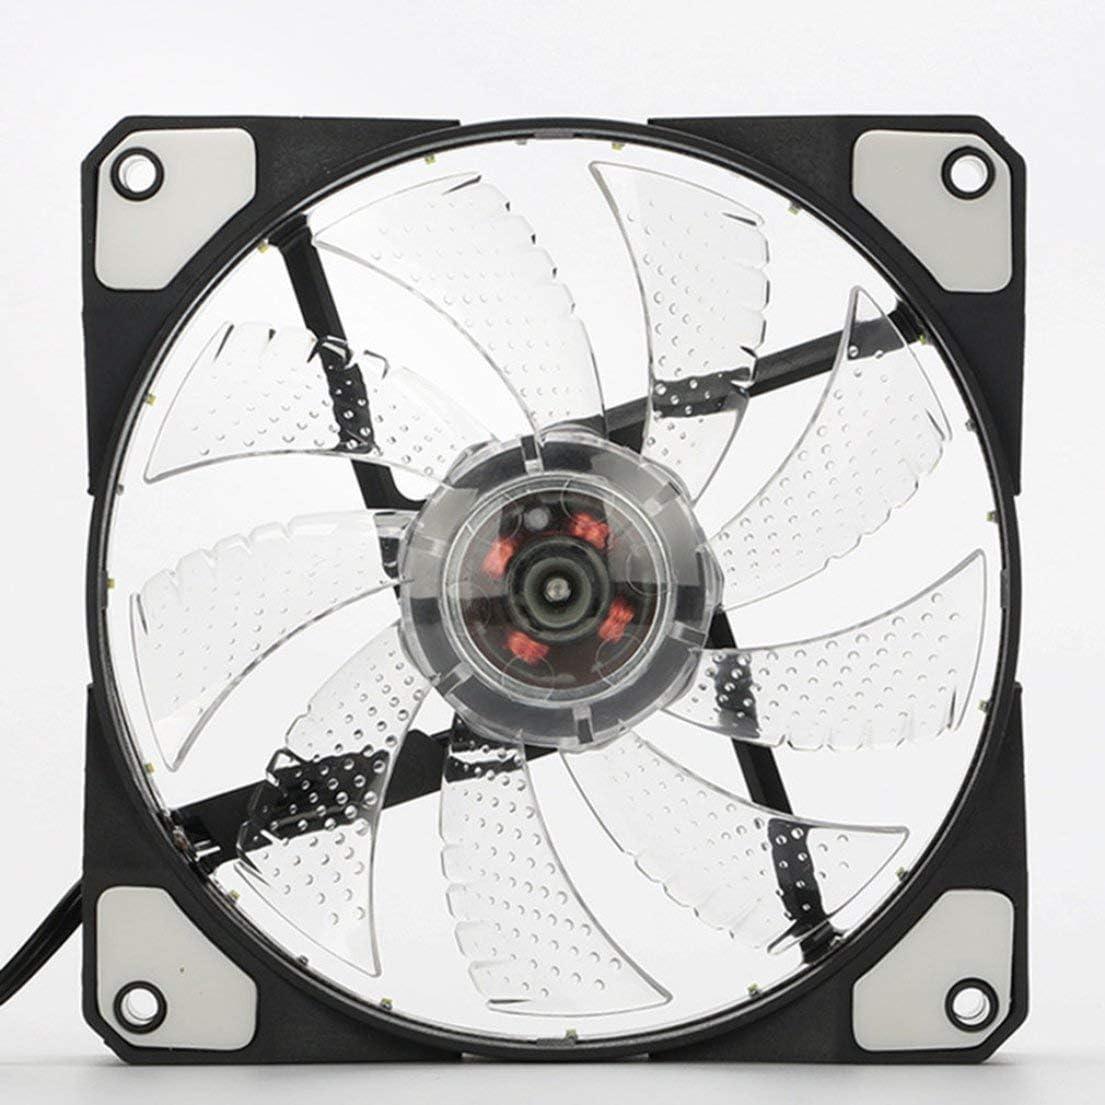 SKYYKS Ventilador de Caja de PC de computadora Ultra silenciosa LED de 120 mm 15 LED de 12V con Conector Molex silencioso de Goma Ventilador fácil de Instalar (Luz Blanca): Amazon.es: Electrónica